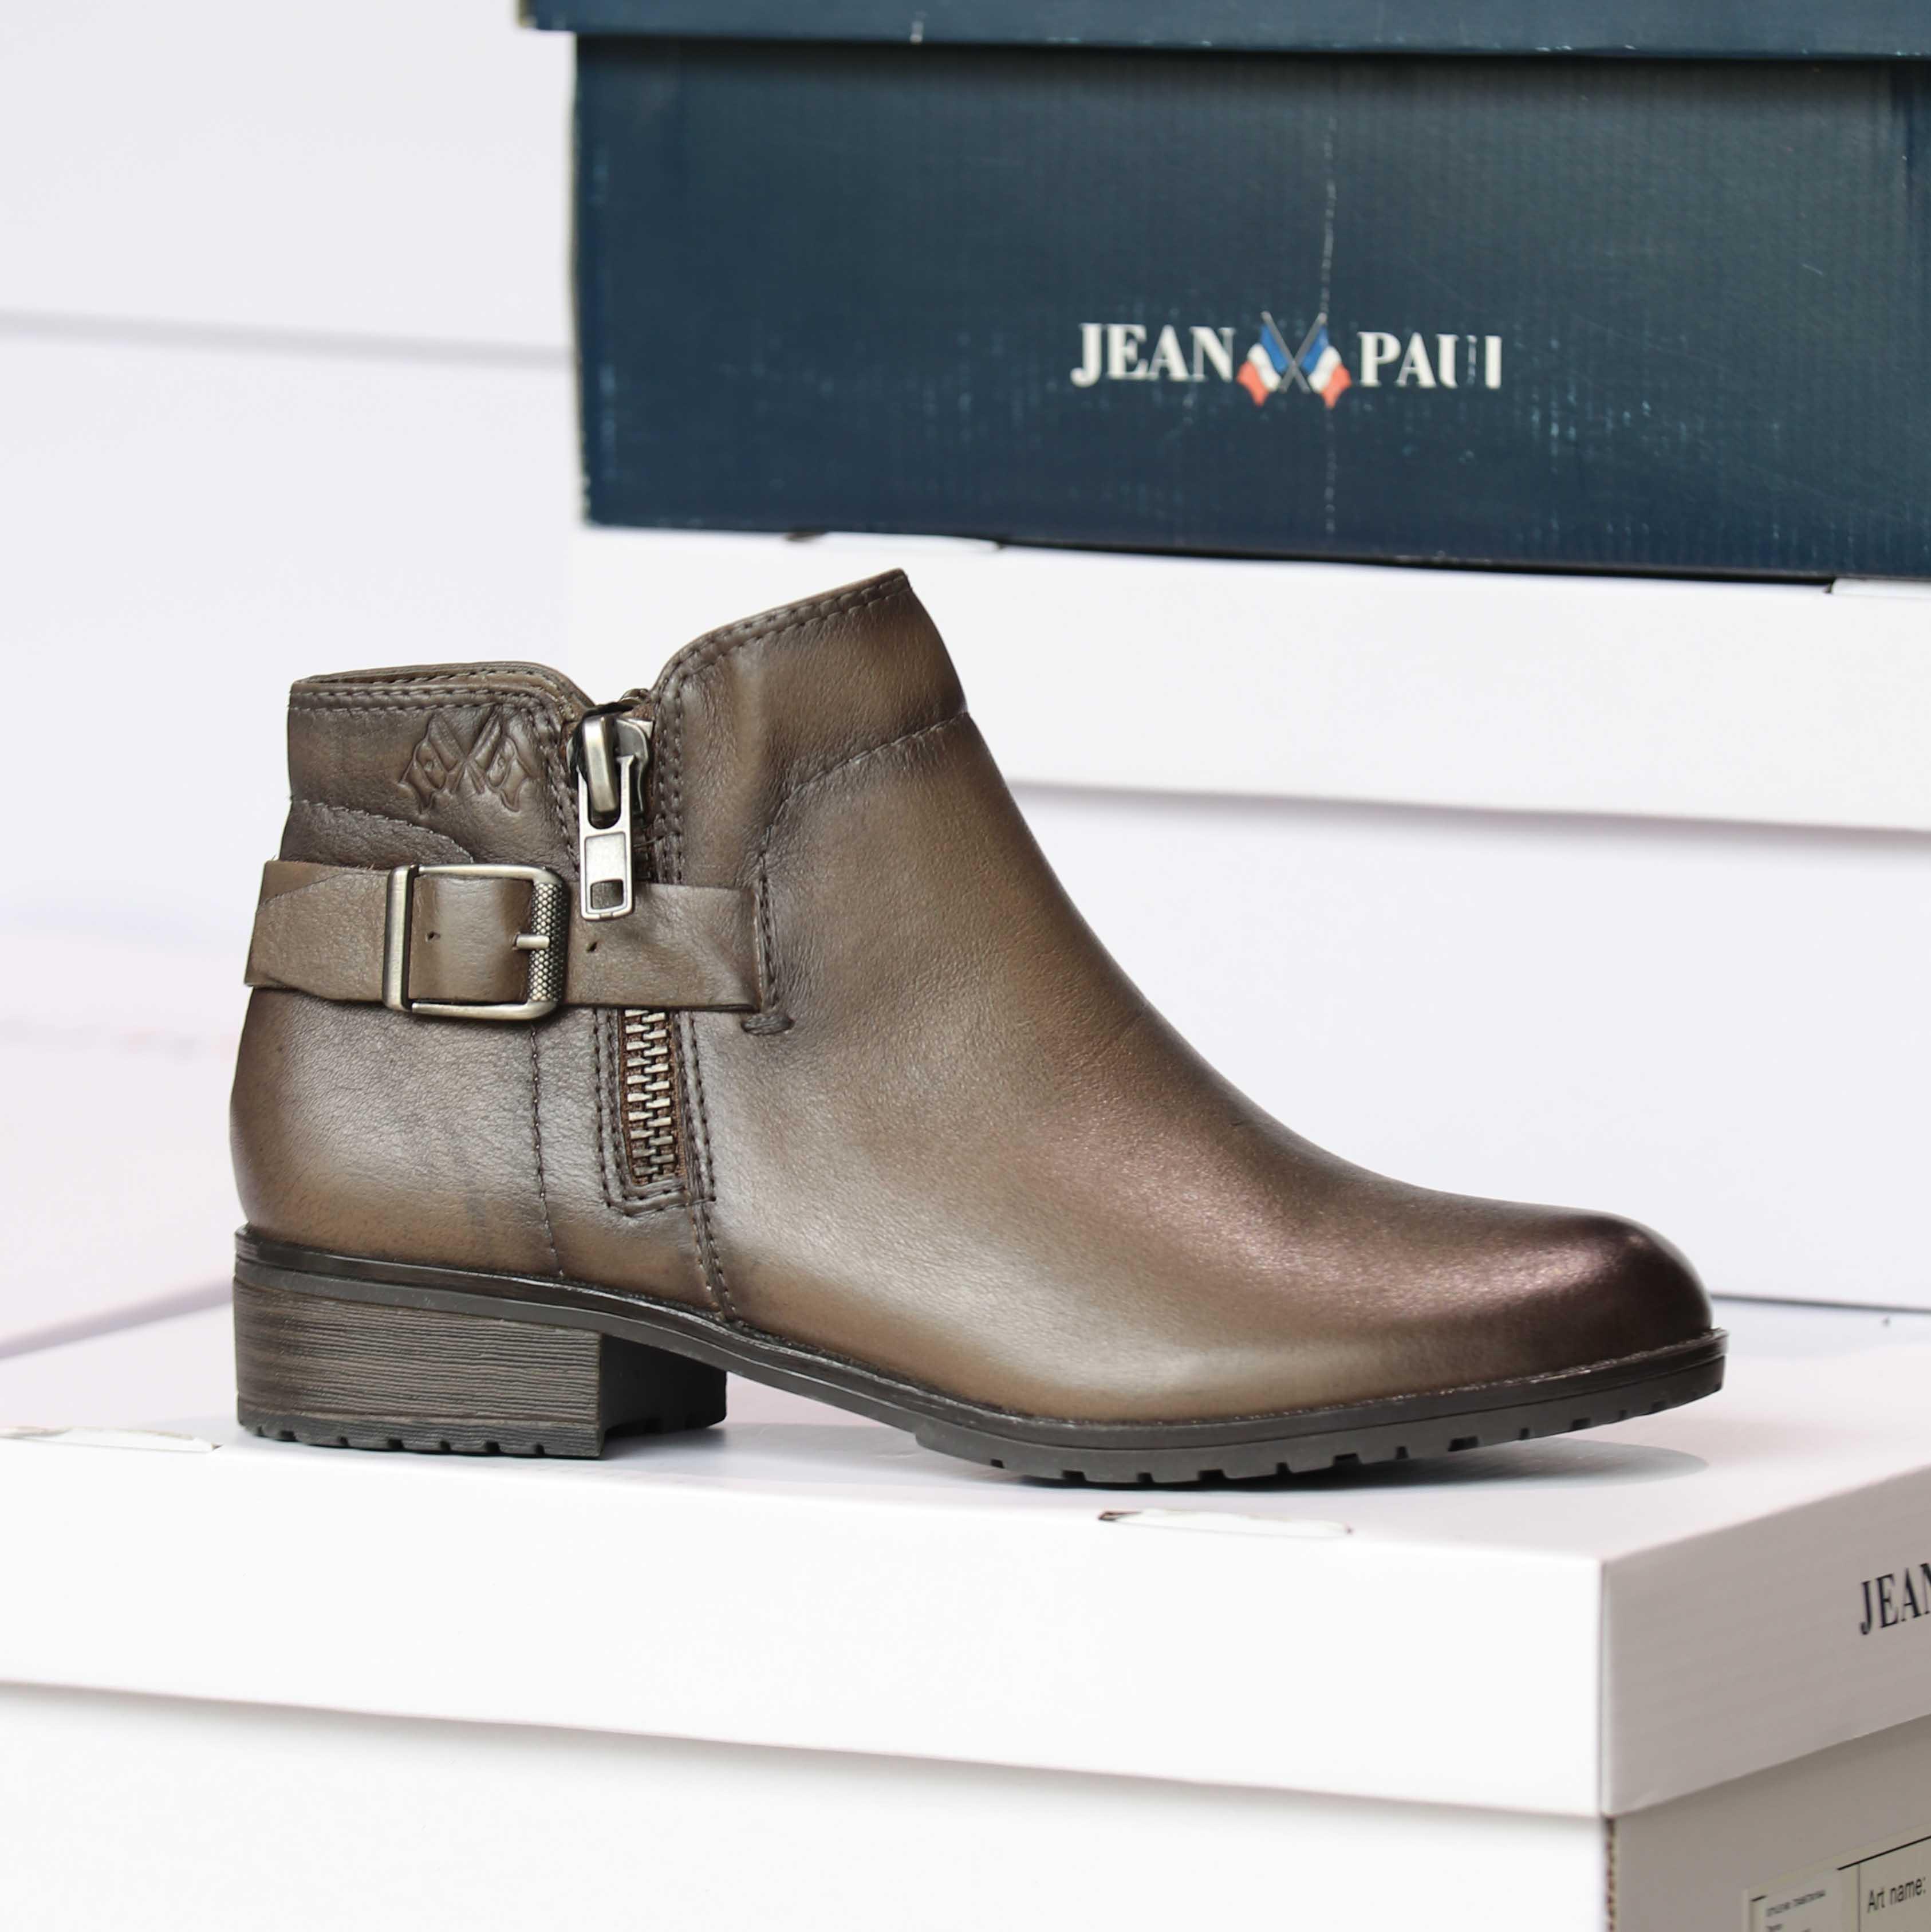 jean paul licini taupe dame skoletter høst sko3